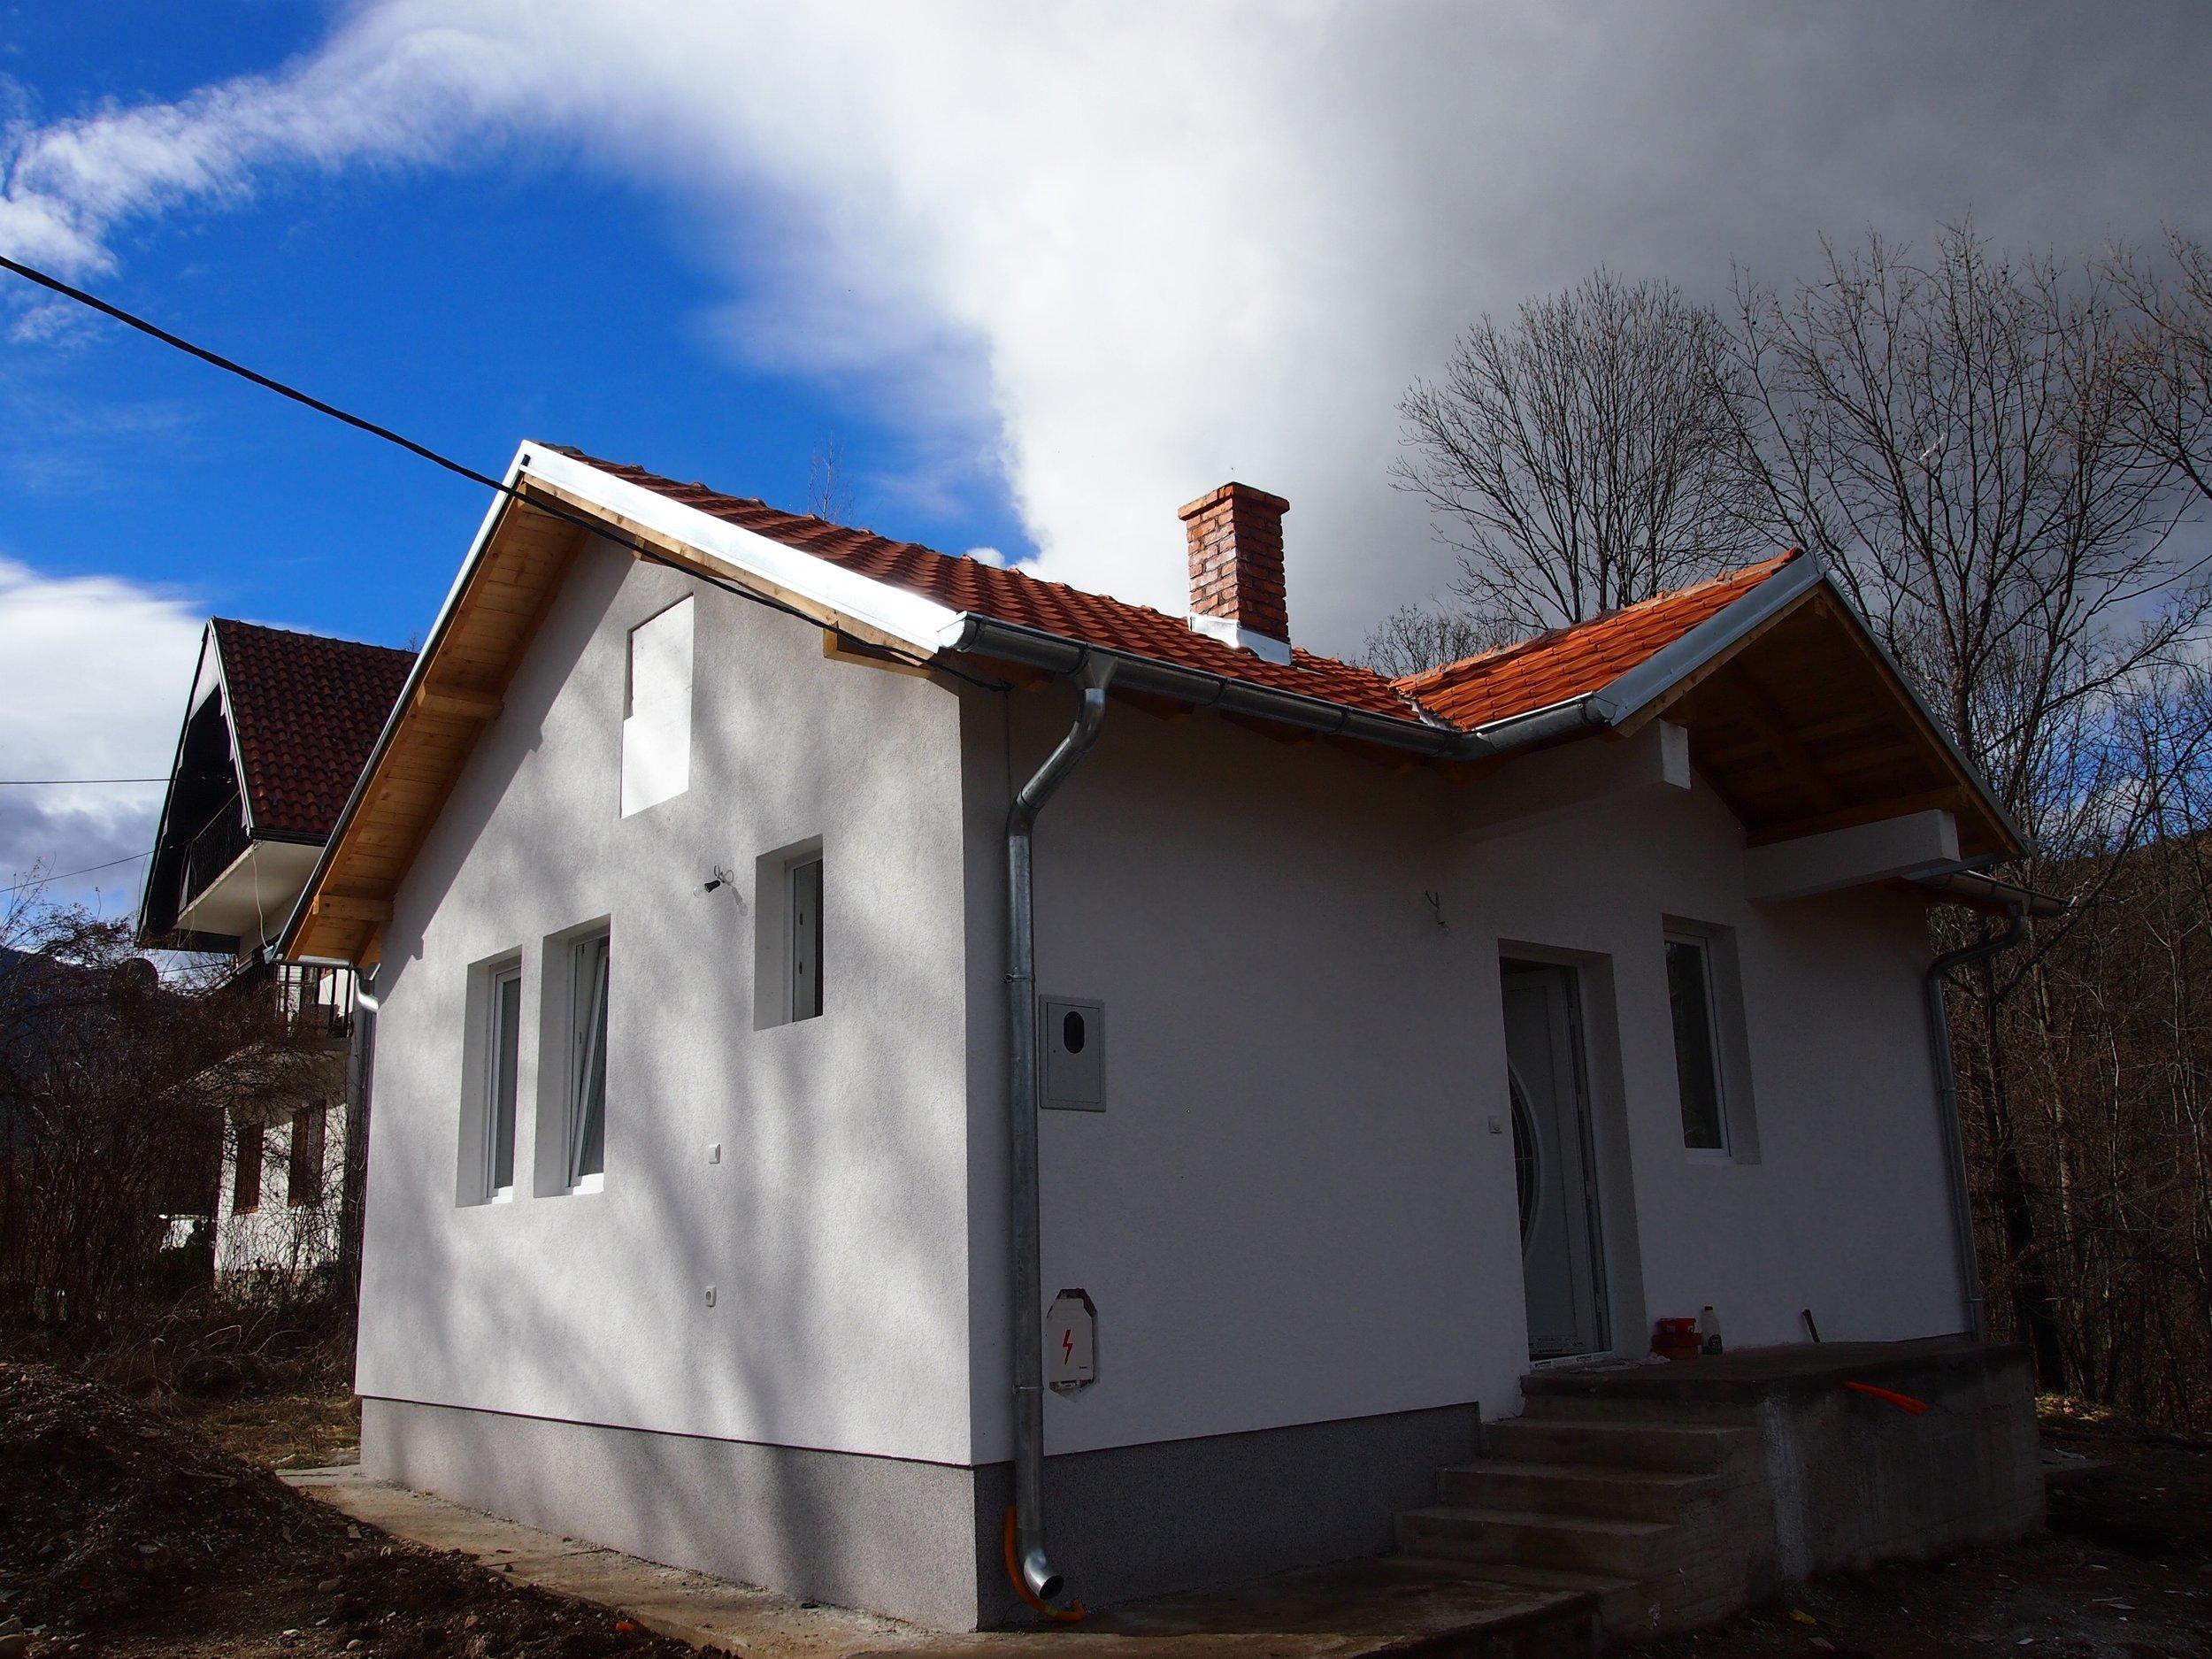 House construction Štrpce/Shtërpcë, Štrpce/Shtërpcë Municipality